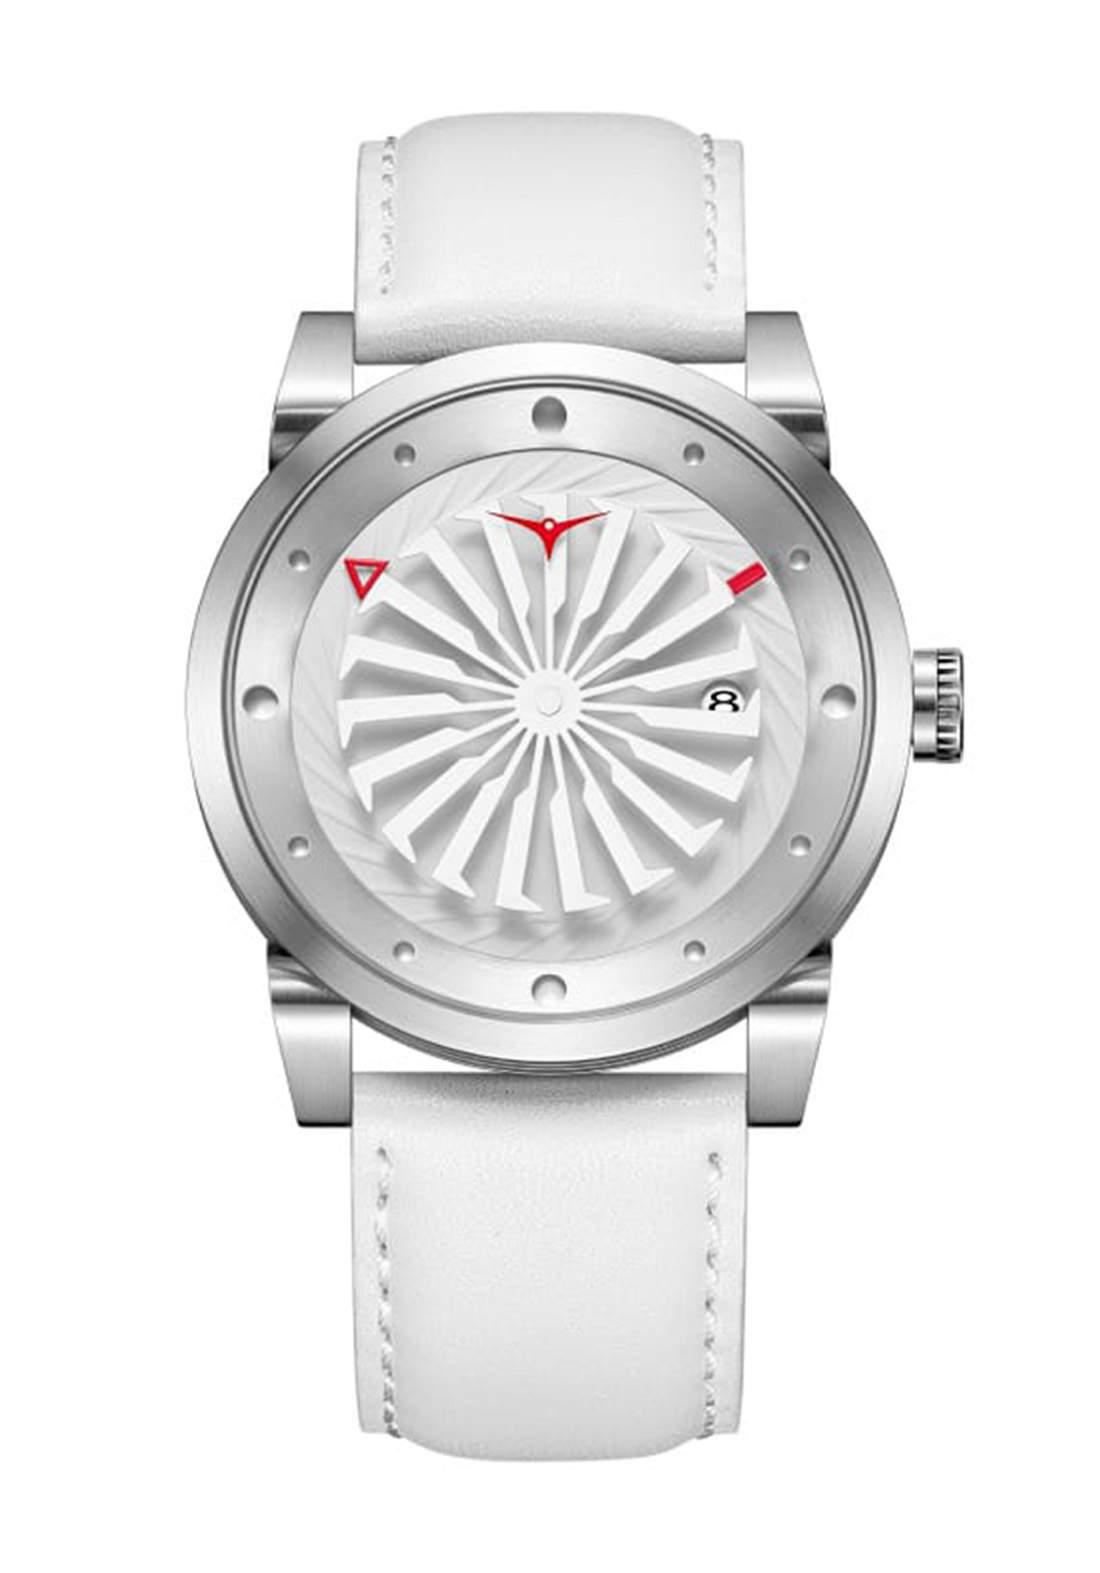 Zinvo Rival Magic Watch For Men - White  ساعة رجالي